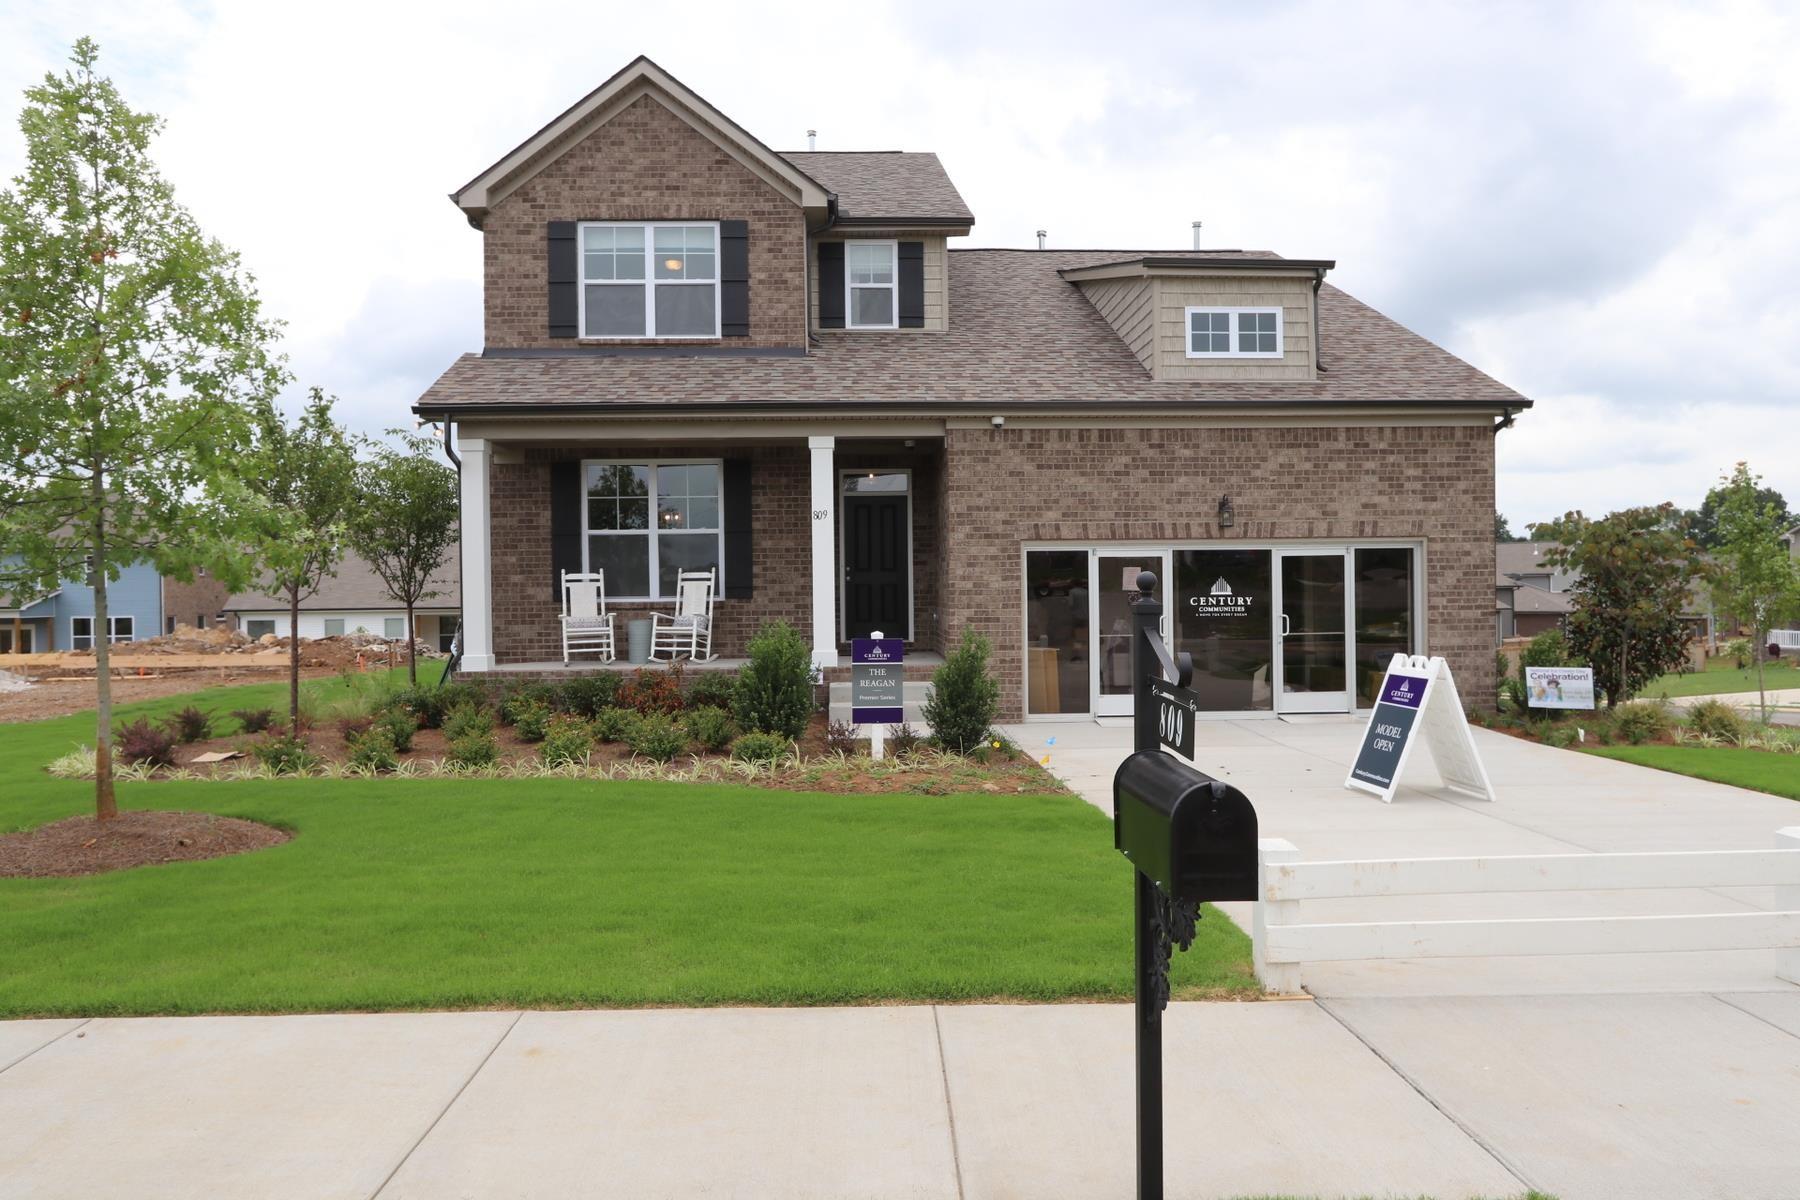 707 Amberton Dr Lot 98, Smyrna, TN 37167 - Smyrna, TN real estate listing